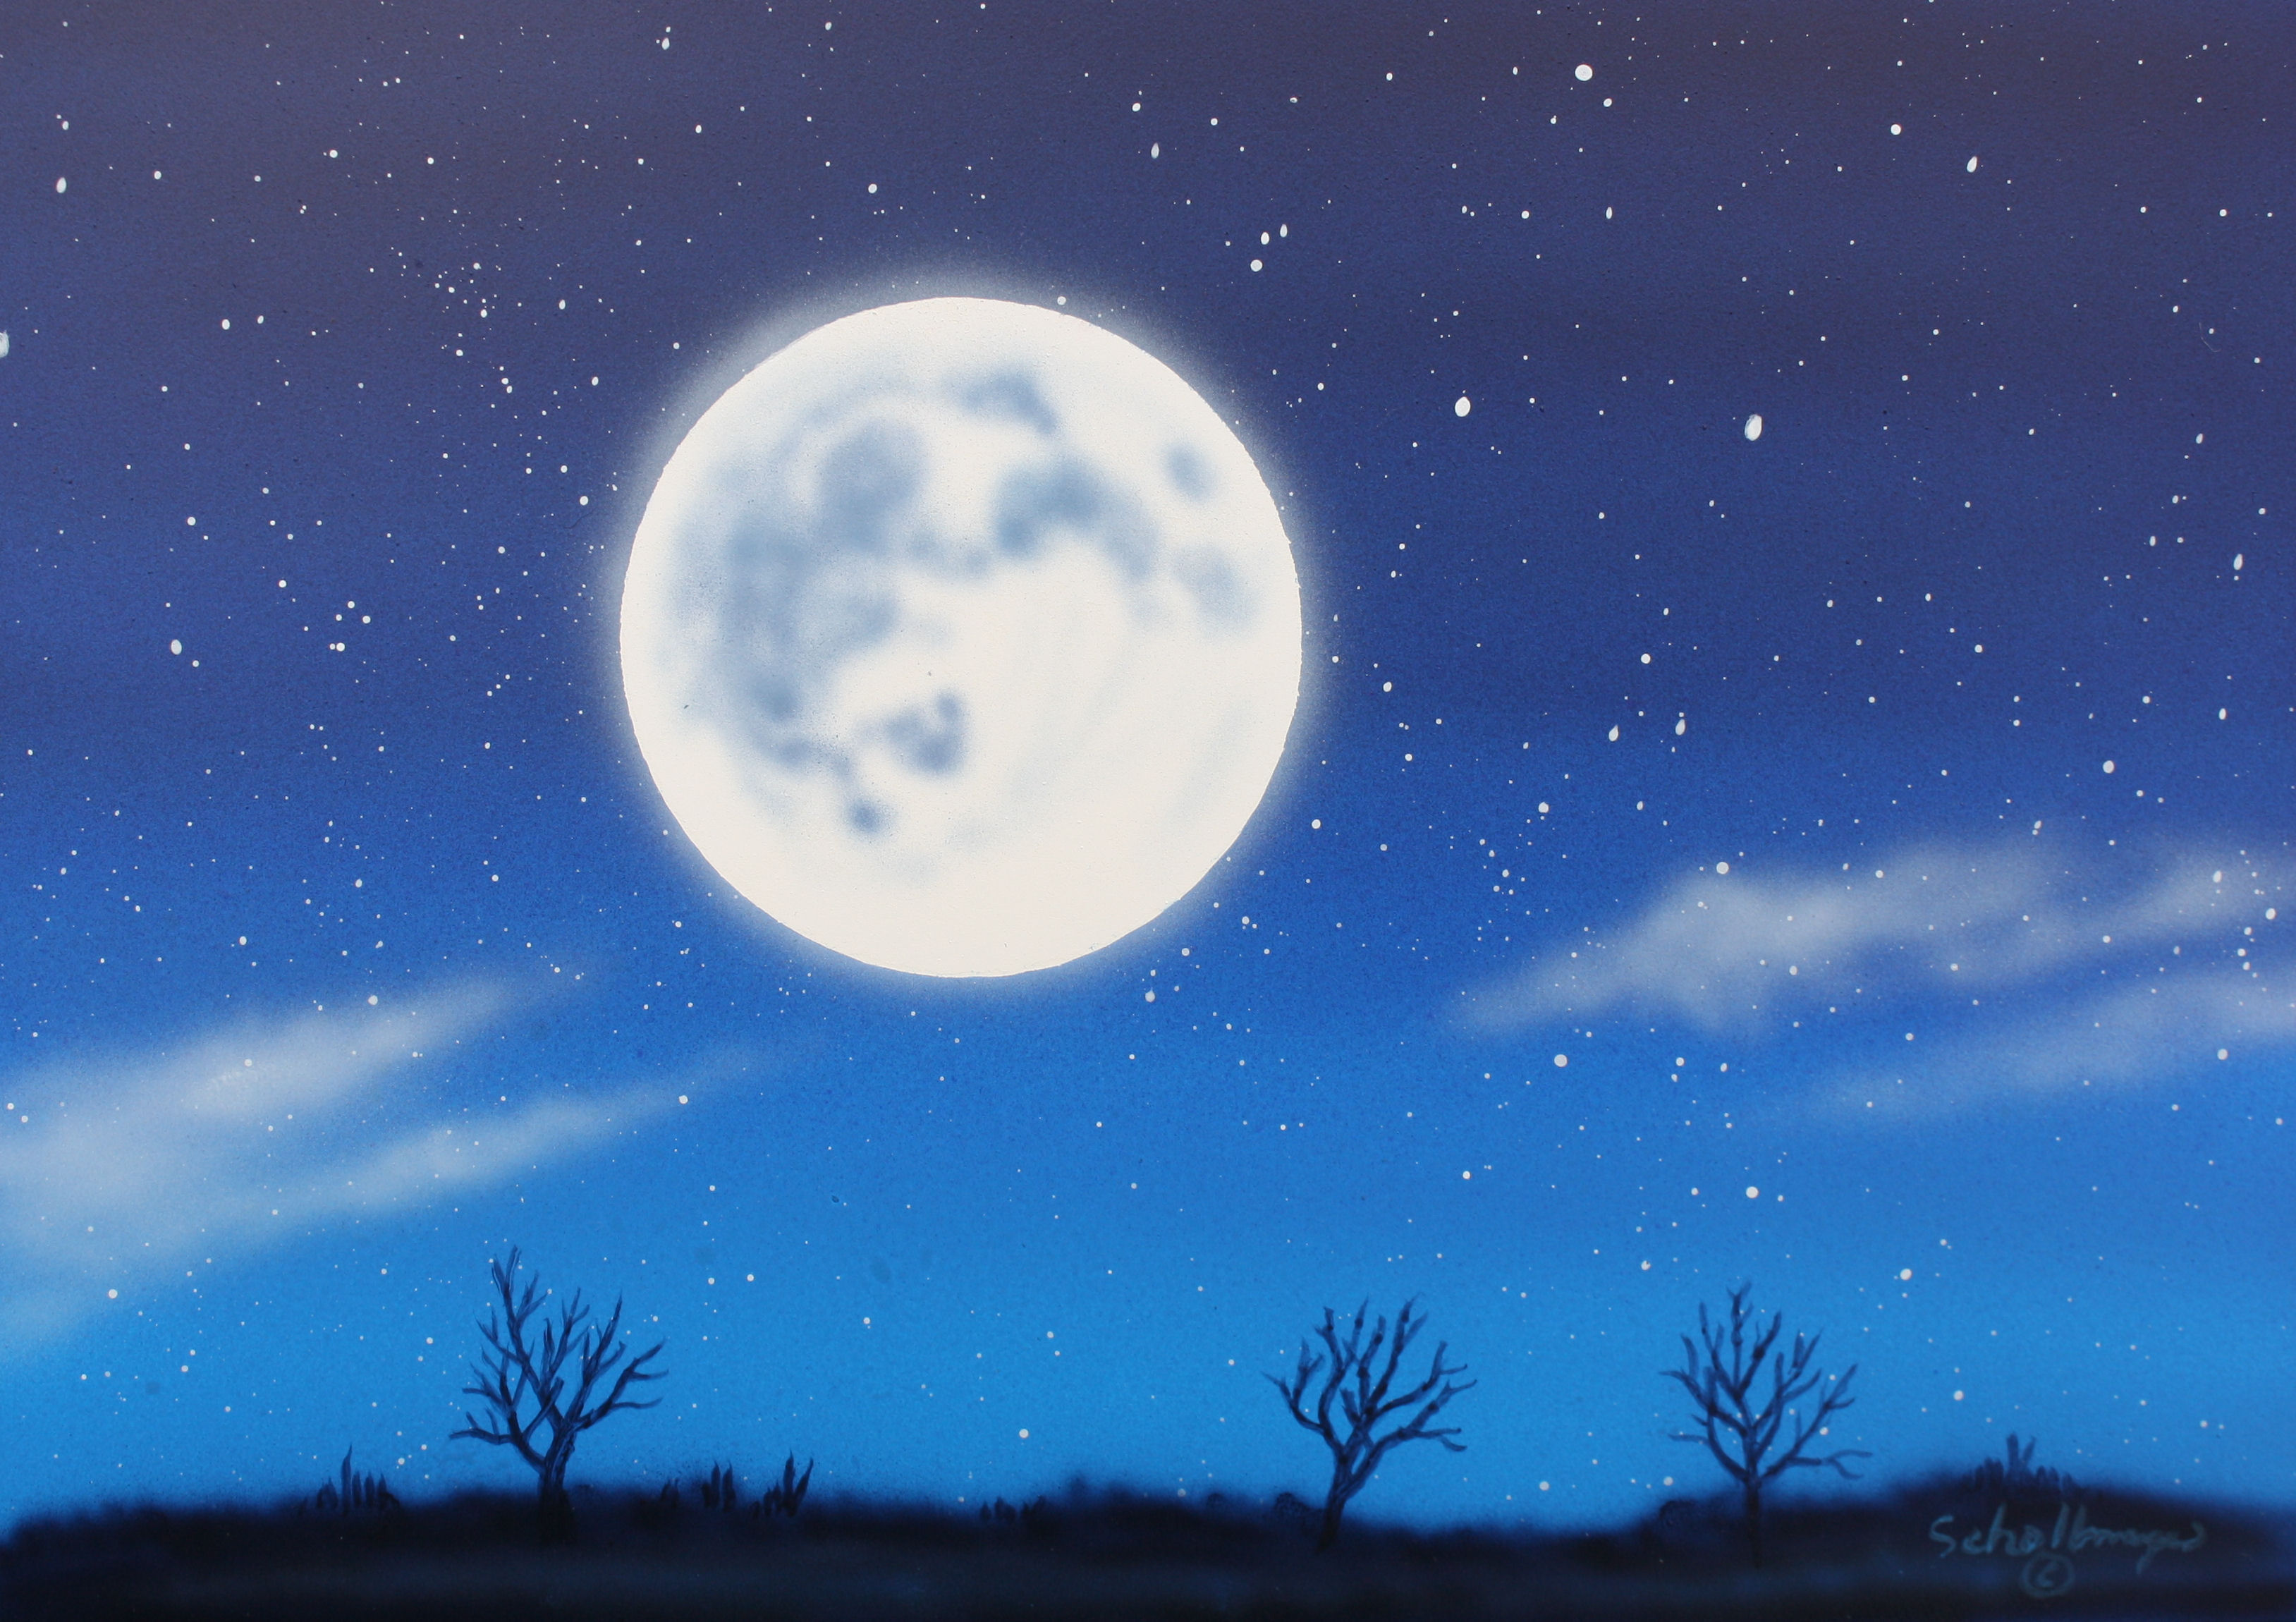 A Van Gogh Night